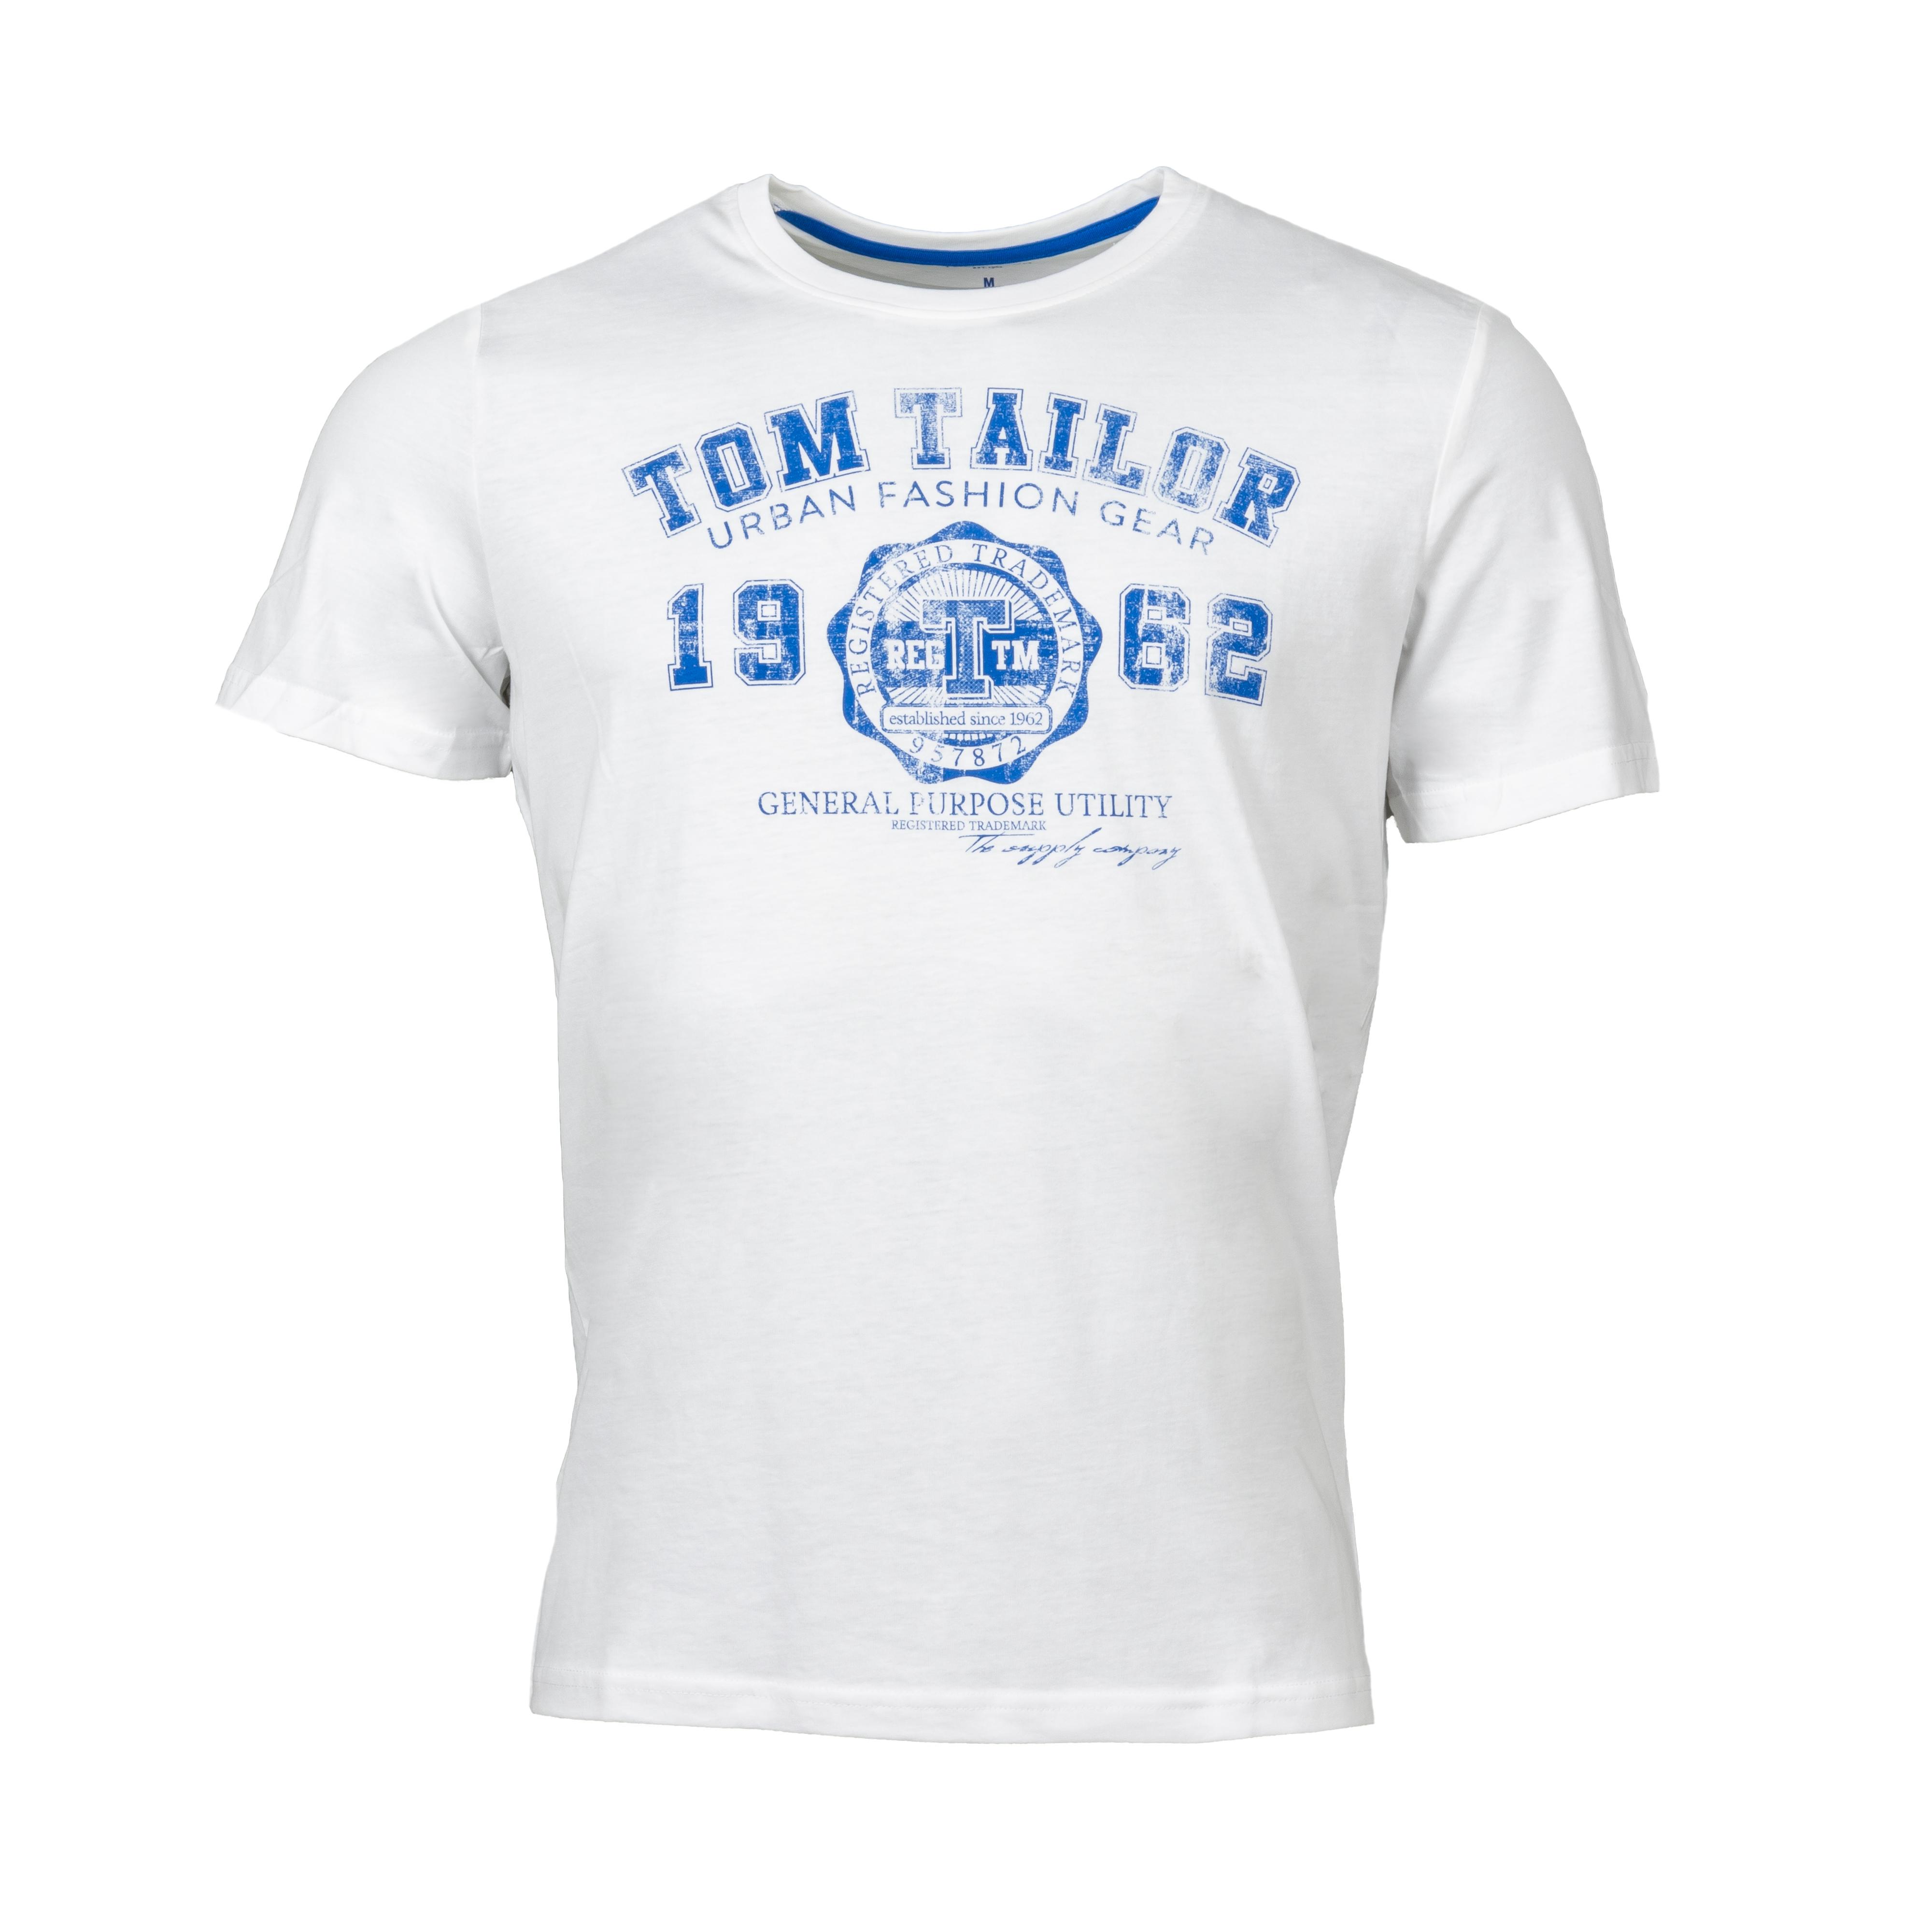 Tee-shirt  en coton blanc floqué bleu turquoise